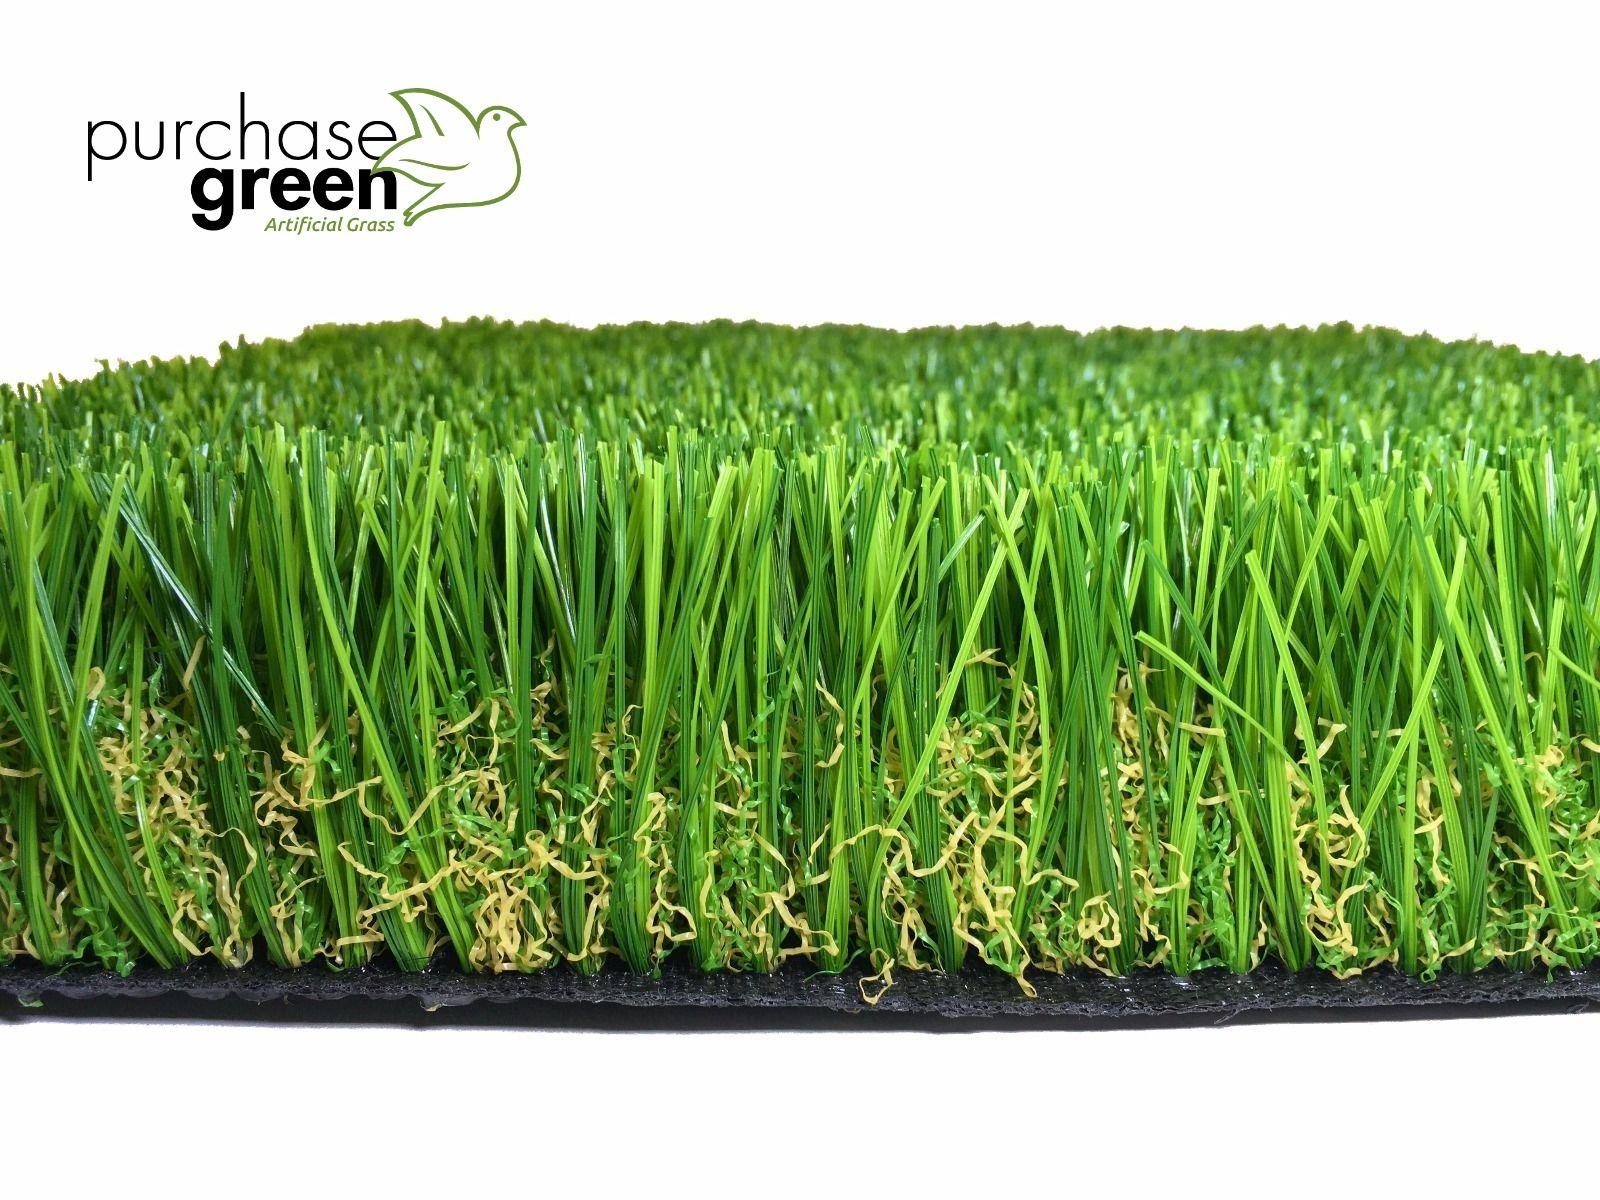 Arizona Platinum Spring Artificial Lawn Grass Artificial Grass Synthetic Lawn